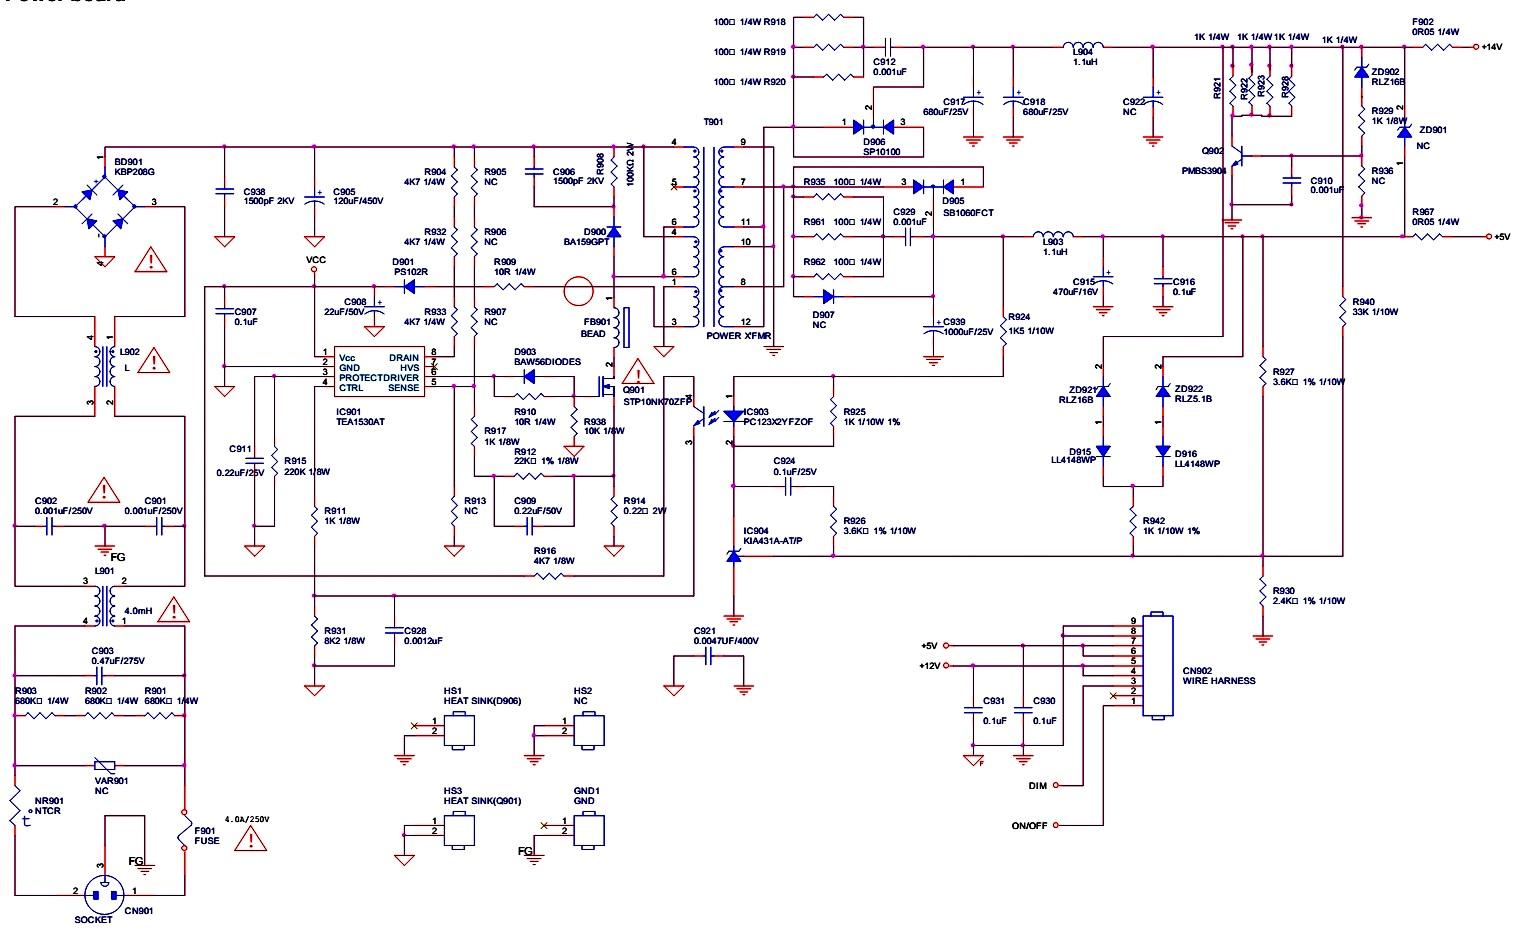 medium resolution of lcd monitor schematic diagram wiring diagram centre samsung lcd monitor schematic diagram lcd monitor schematic diagram